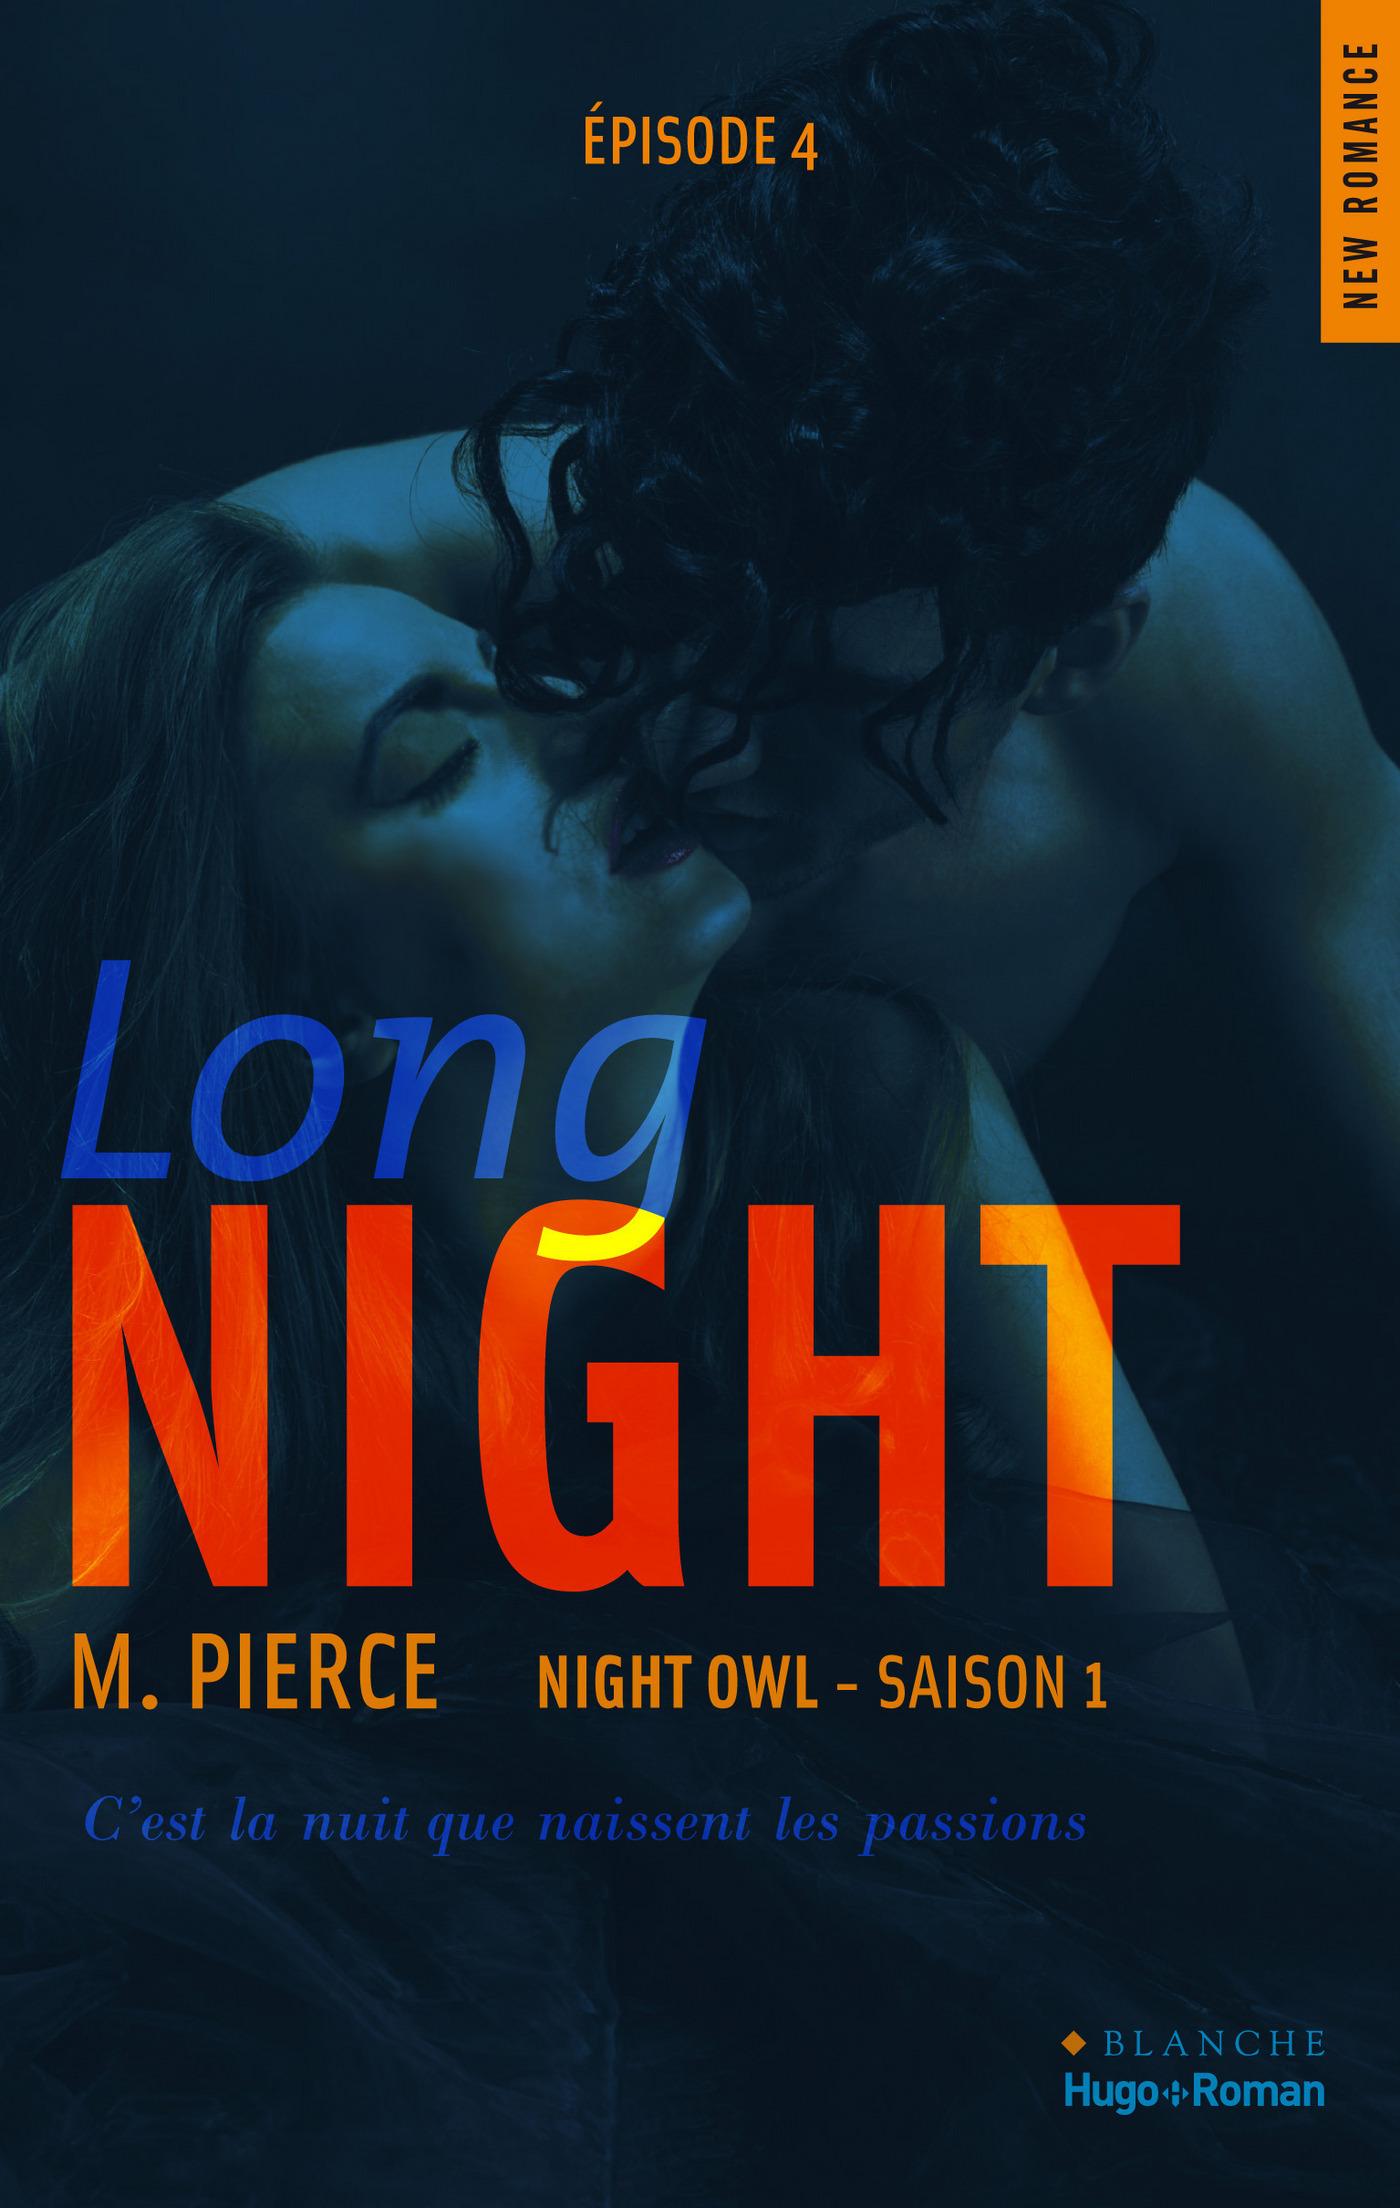 Long Night Episode 4 Night owl Saison 1 (ebook)